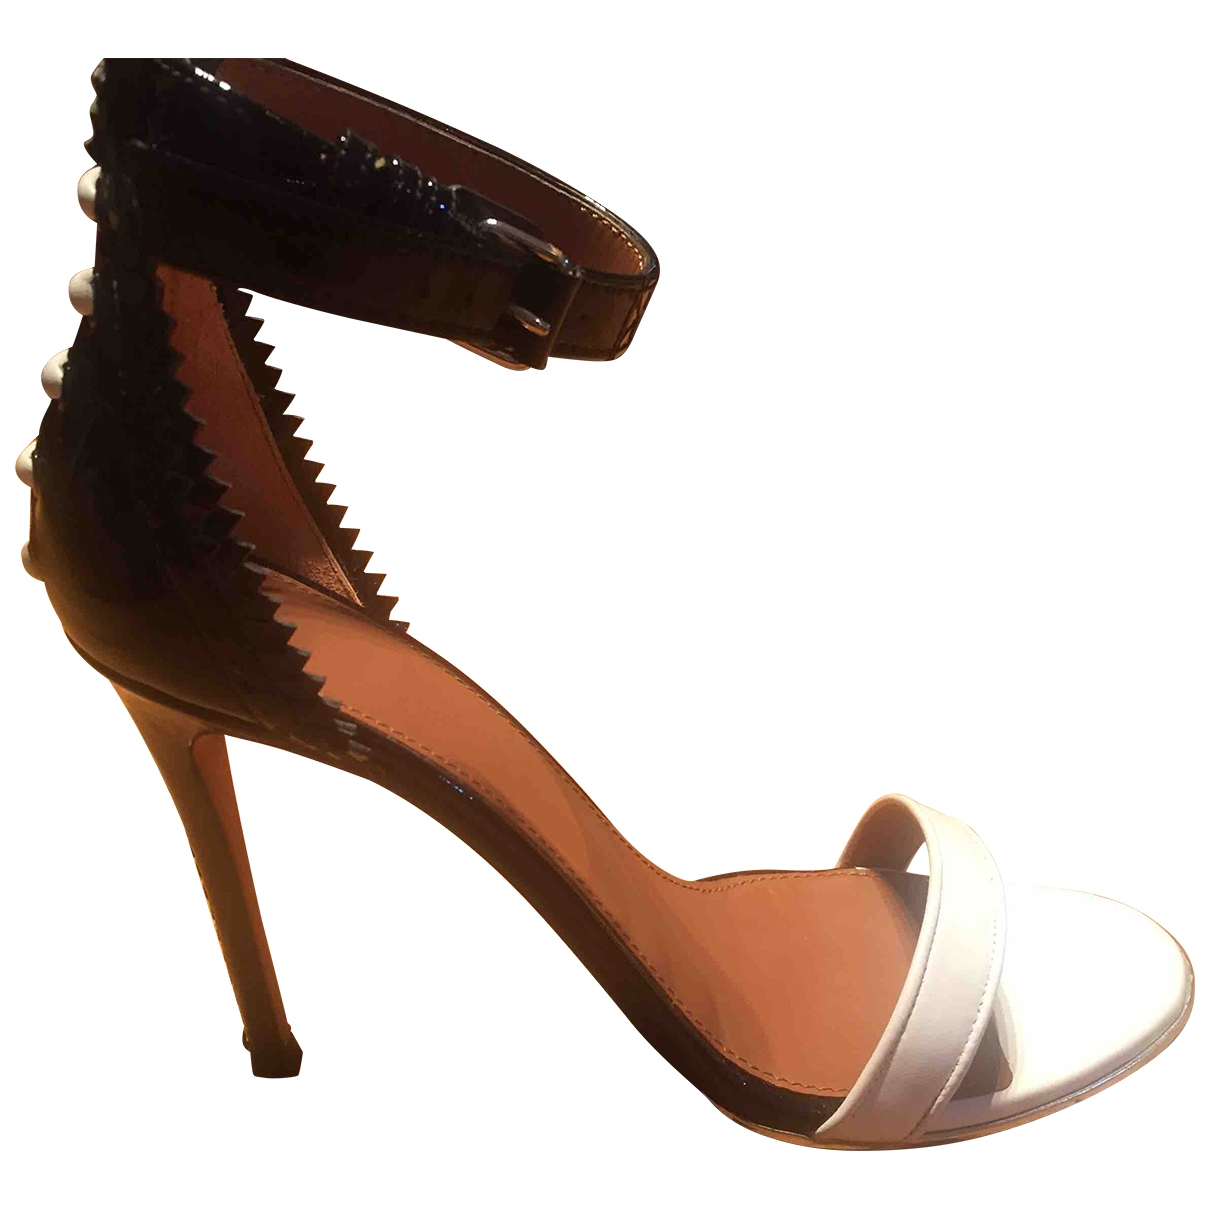 Sandalias romanas de Cuero Givenchy